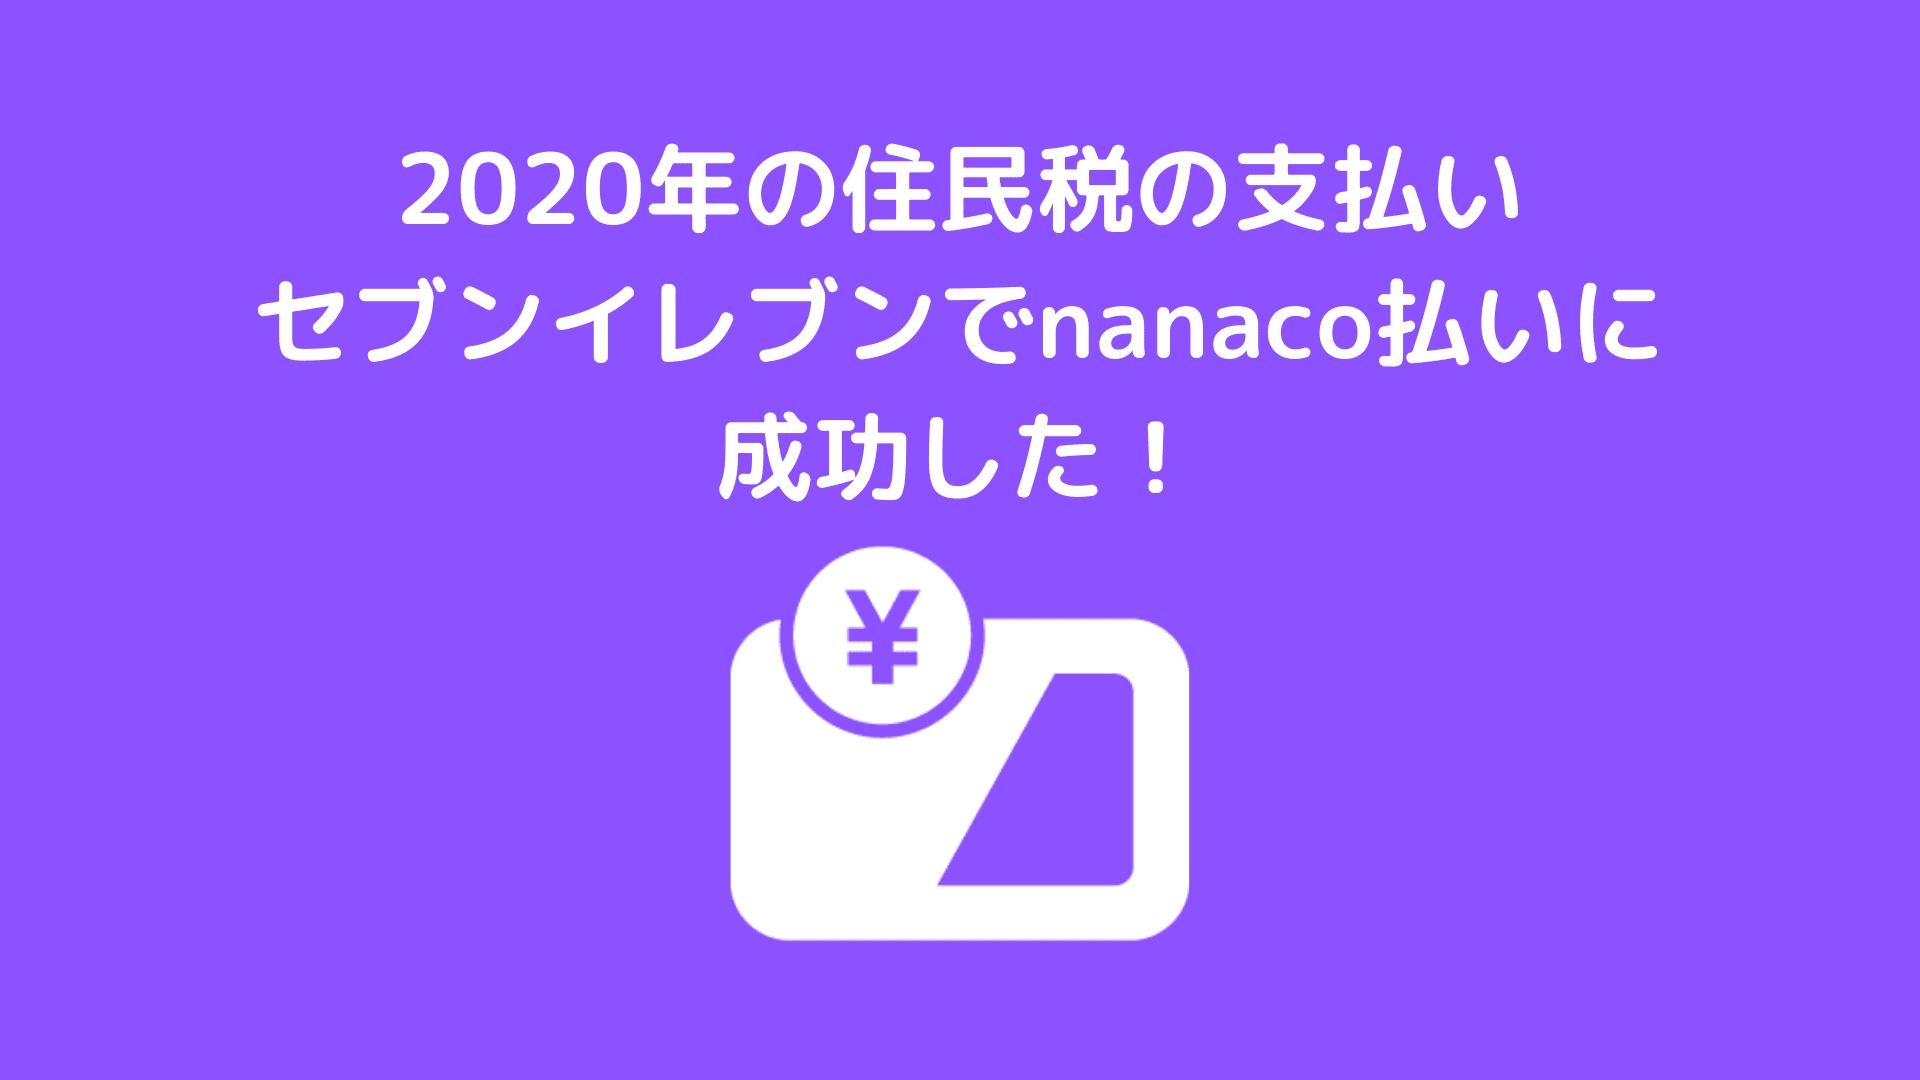 0001 8036487513